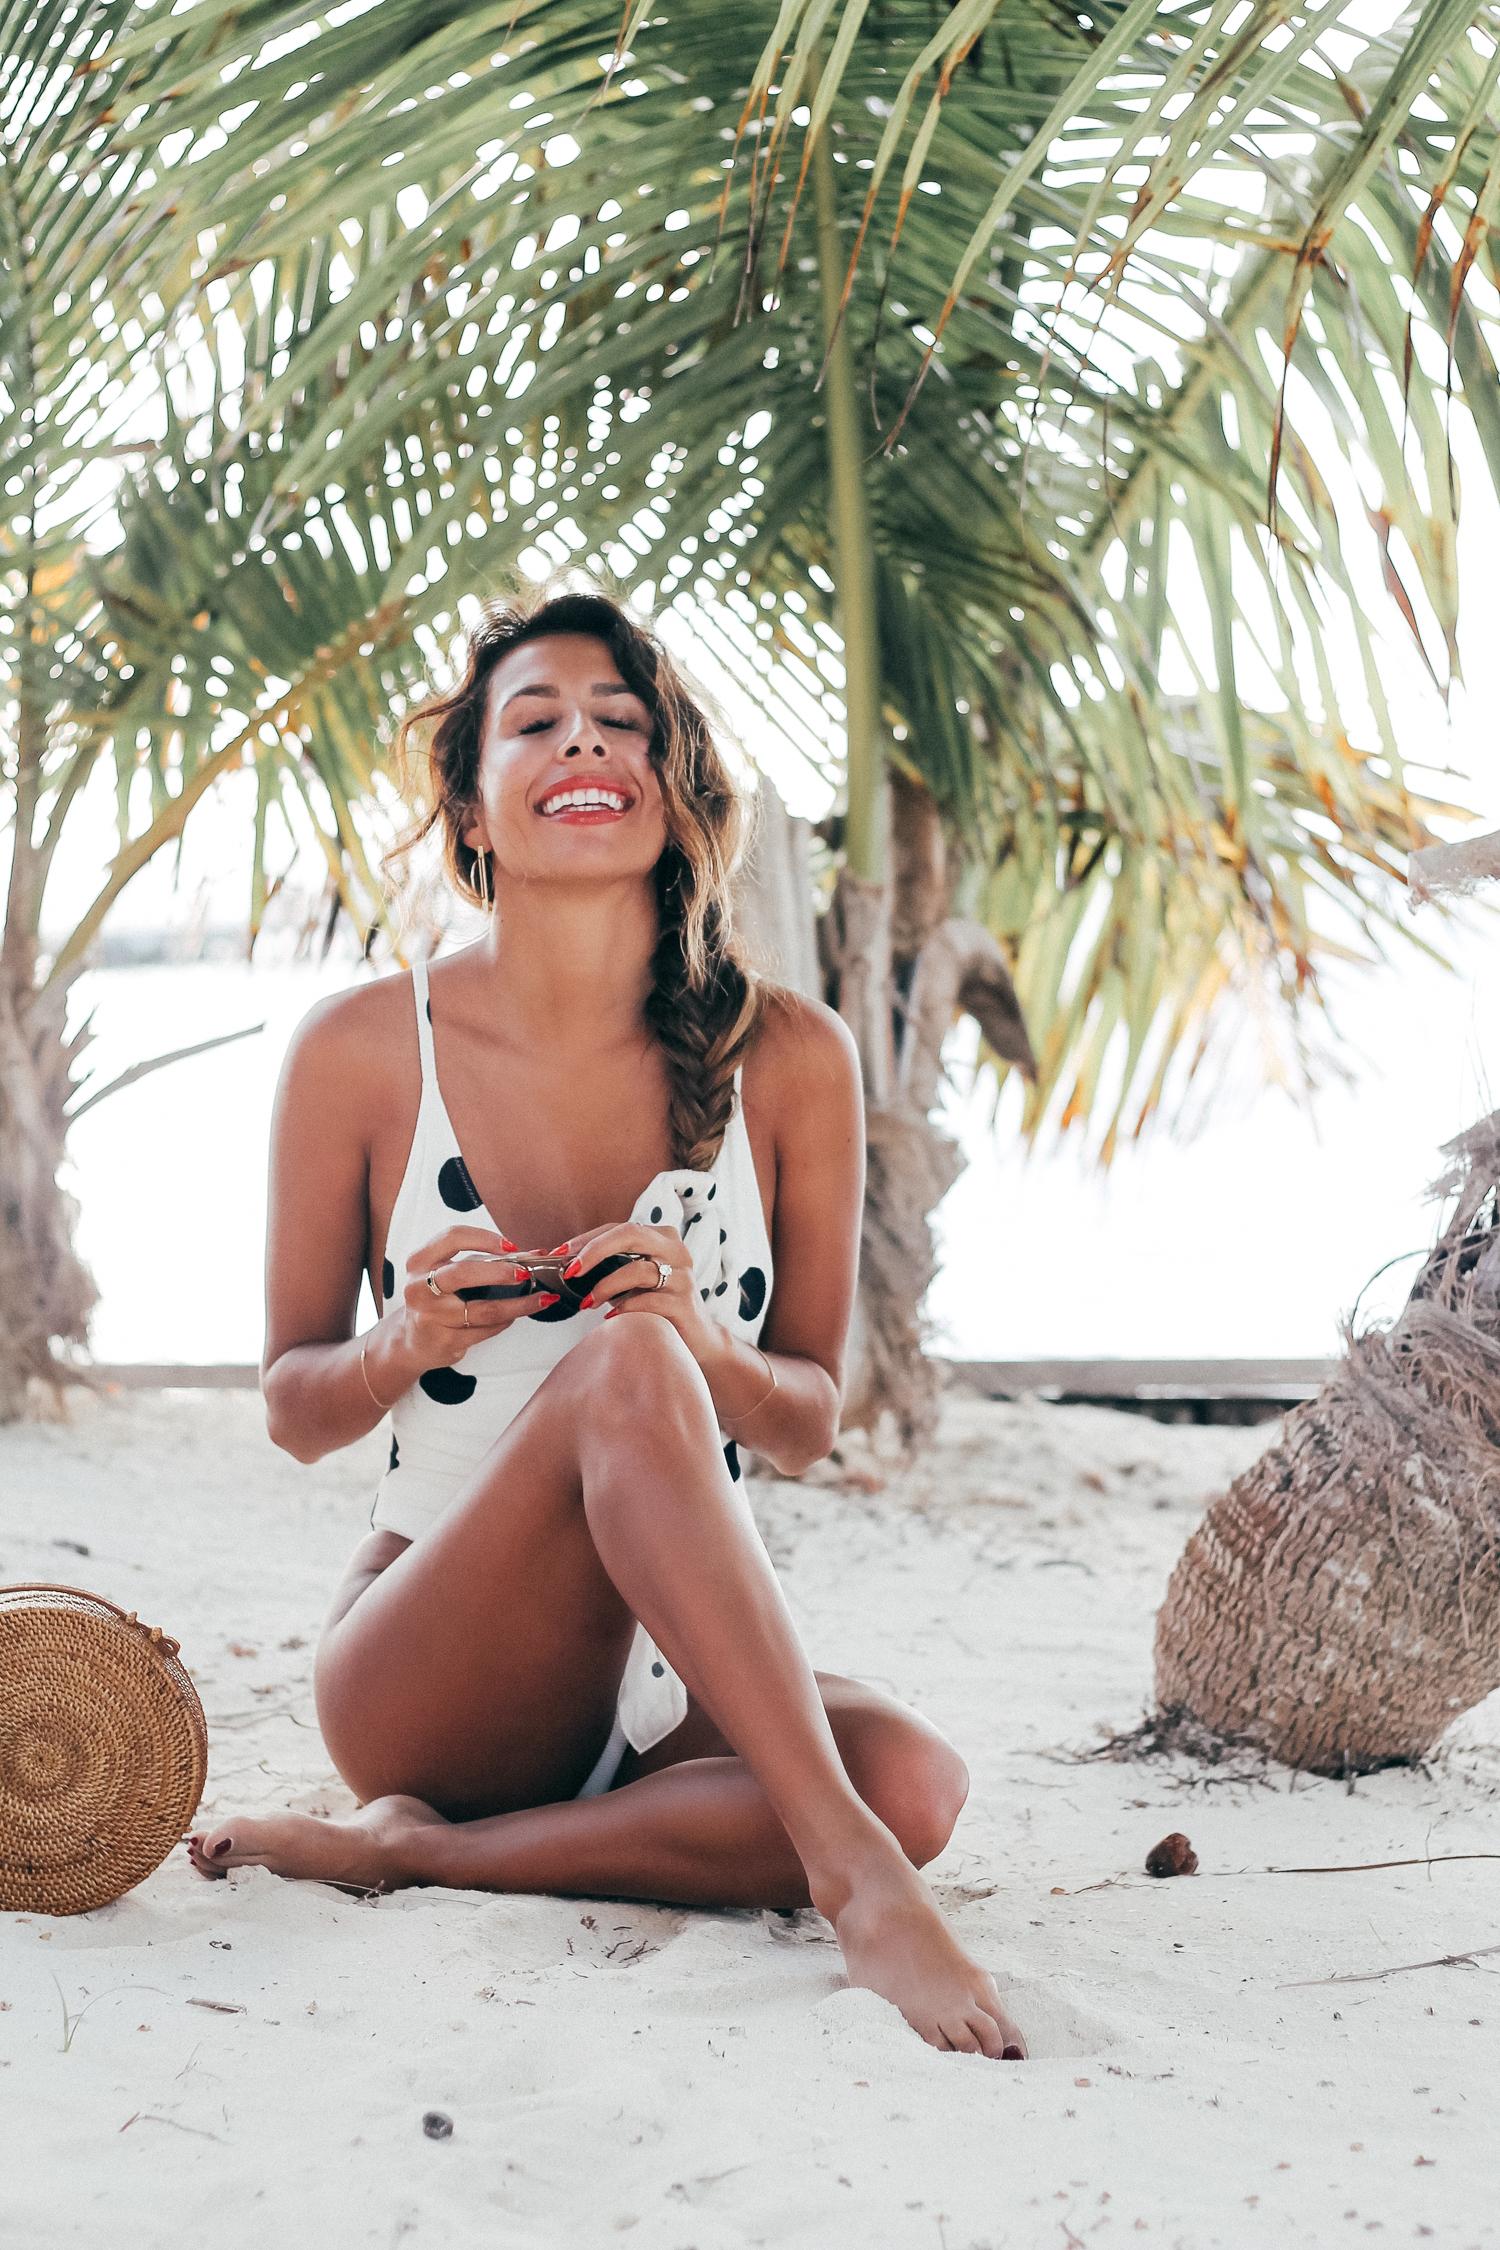 Zara Polka Dot One-Piece Swimsuit   Matachica Resort, Belize